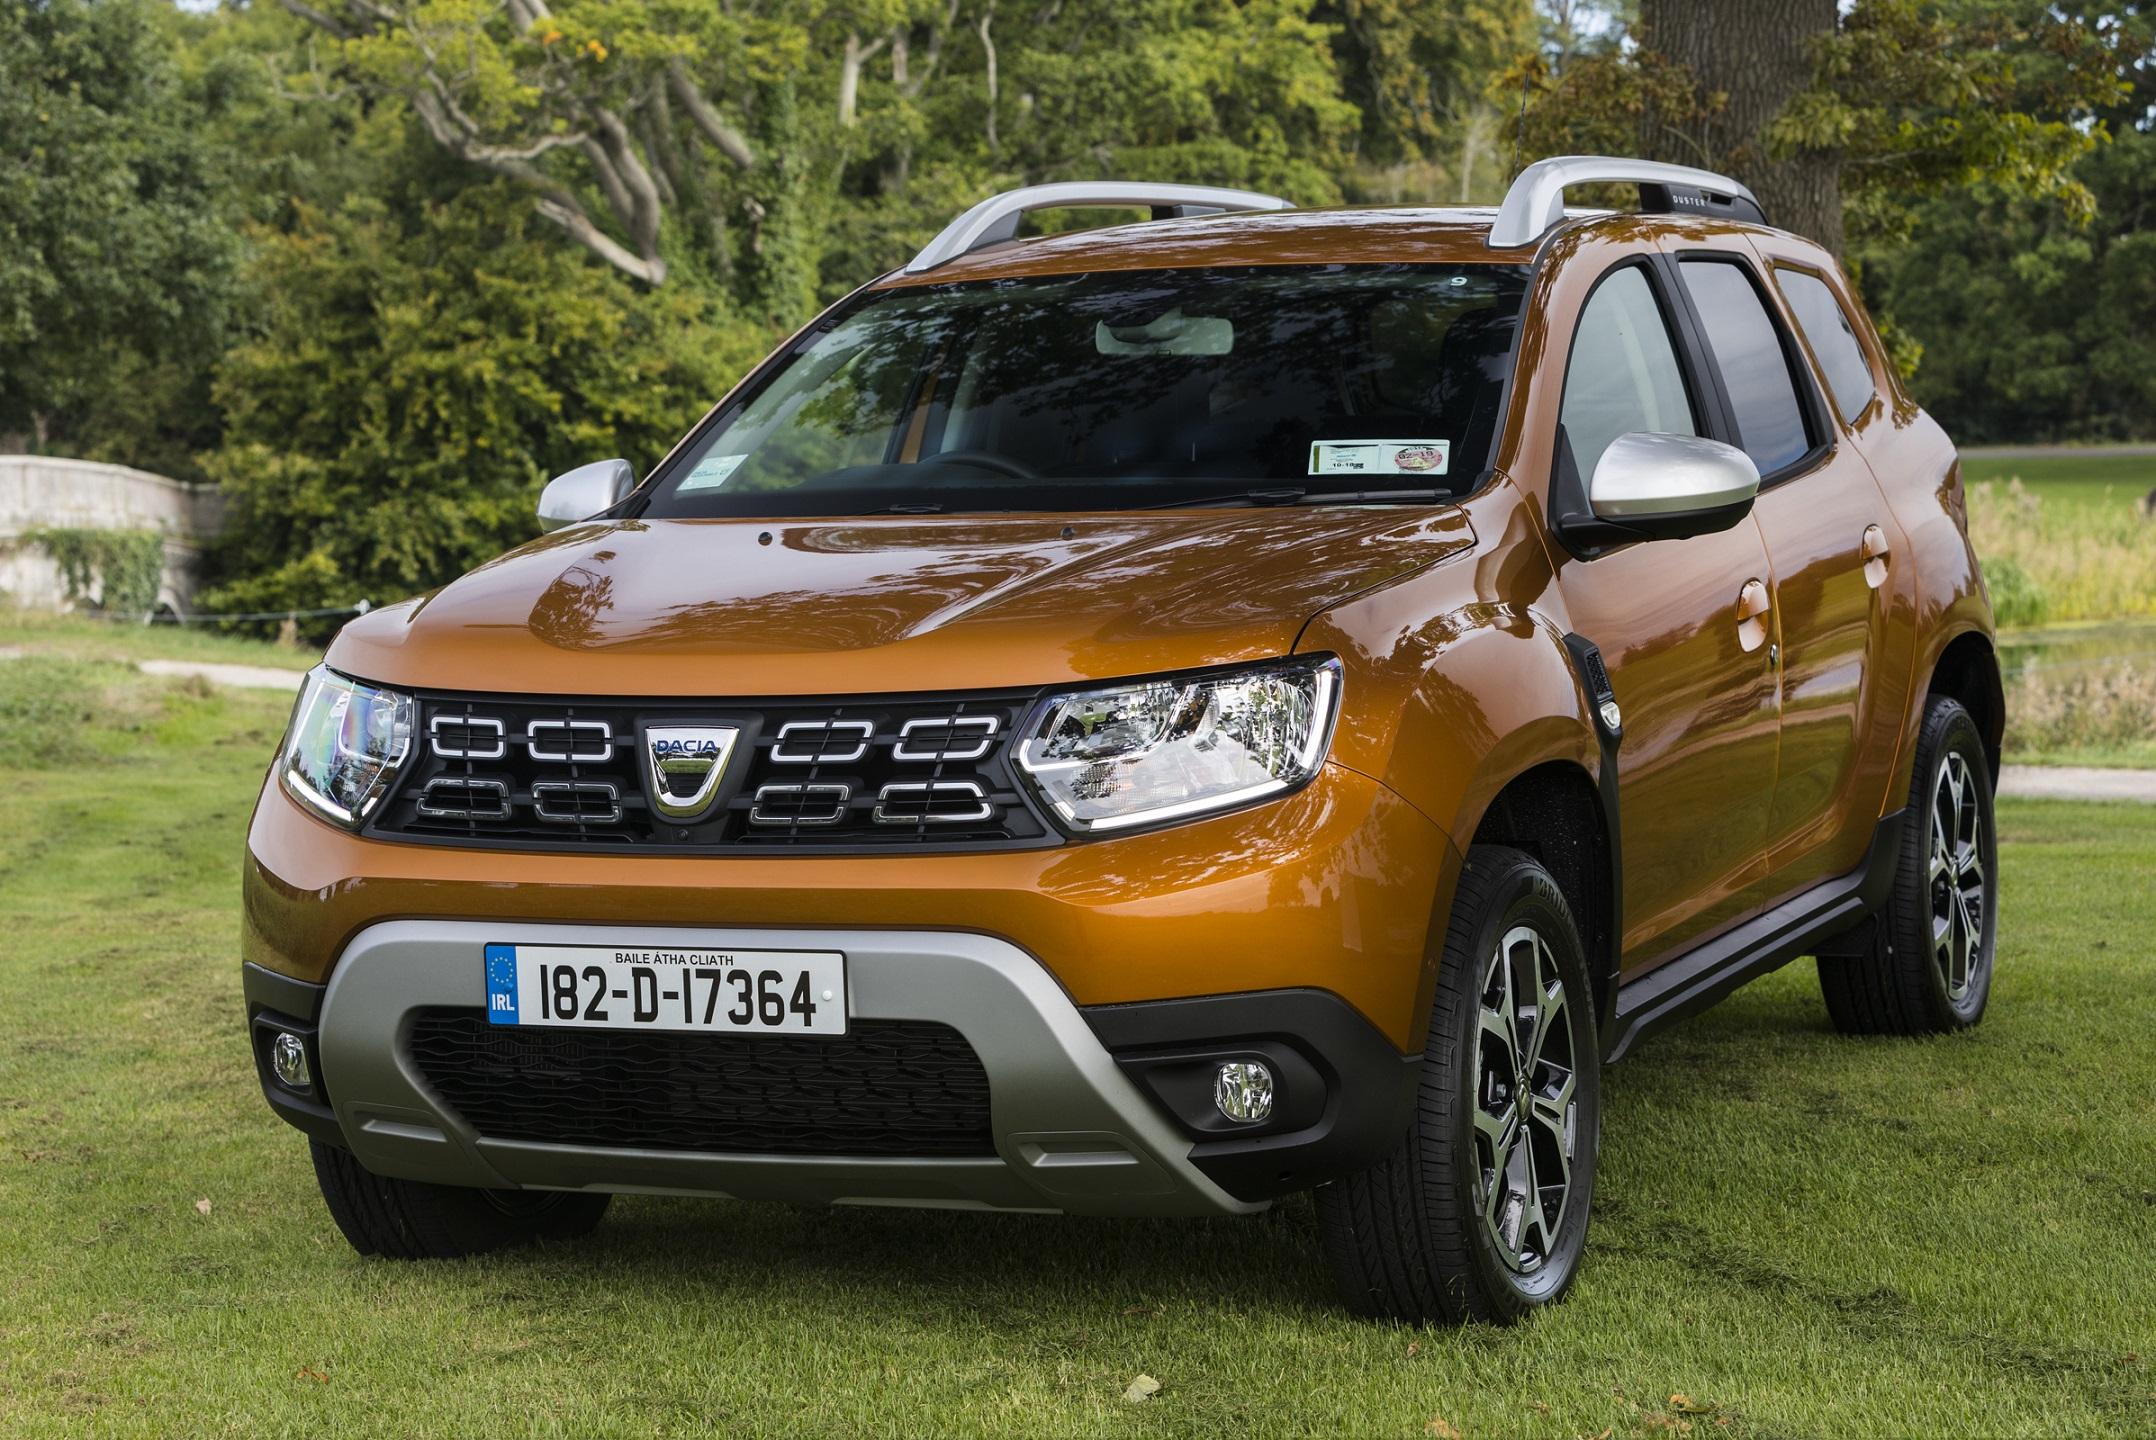 First Irish standalone Dacia showroom opens